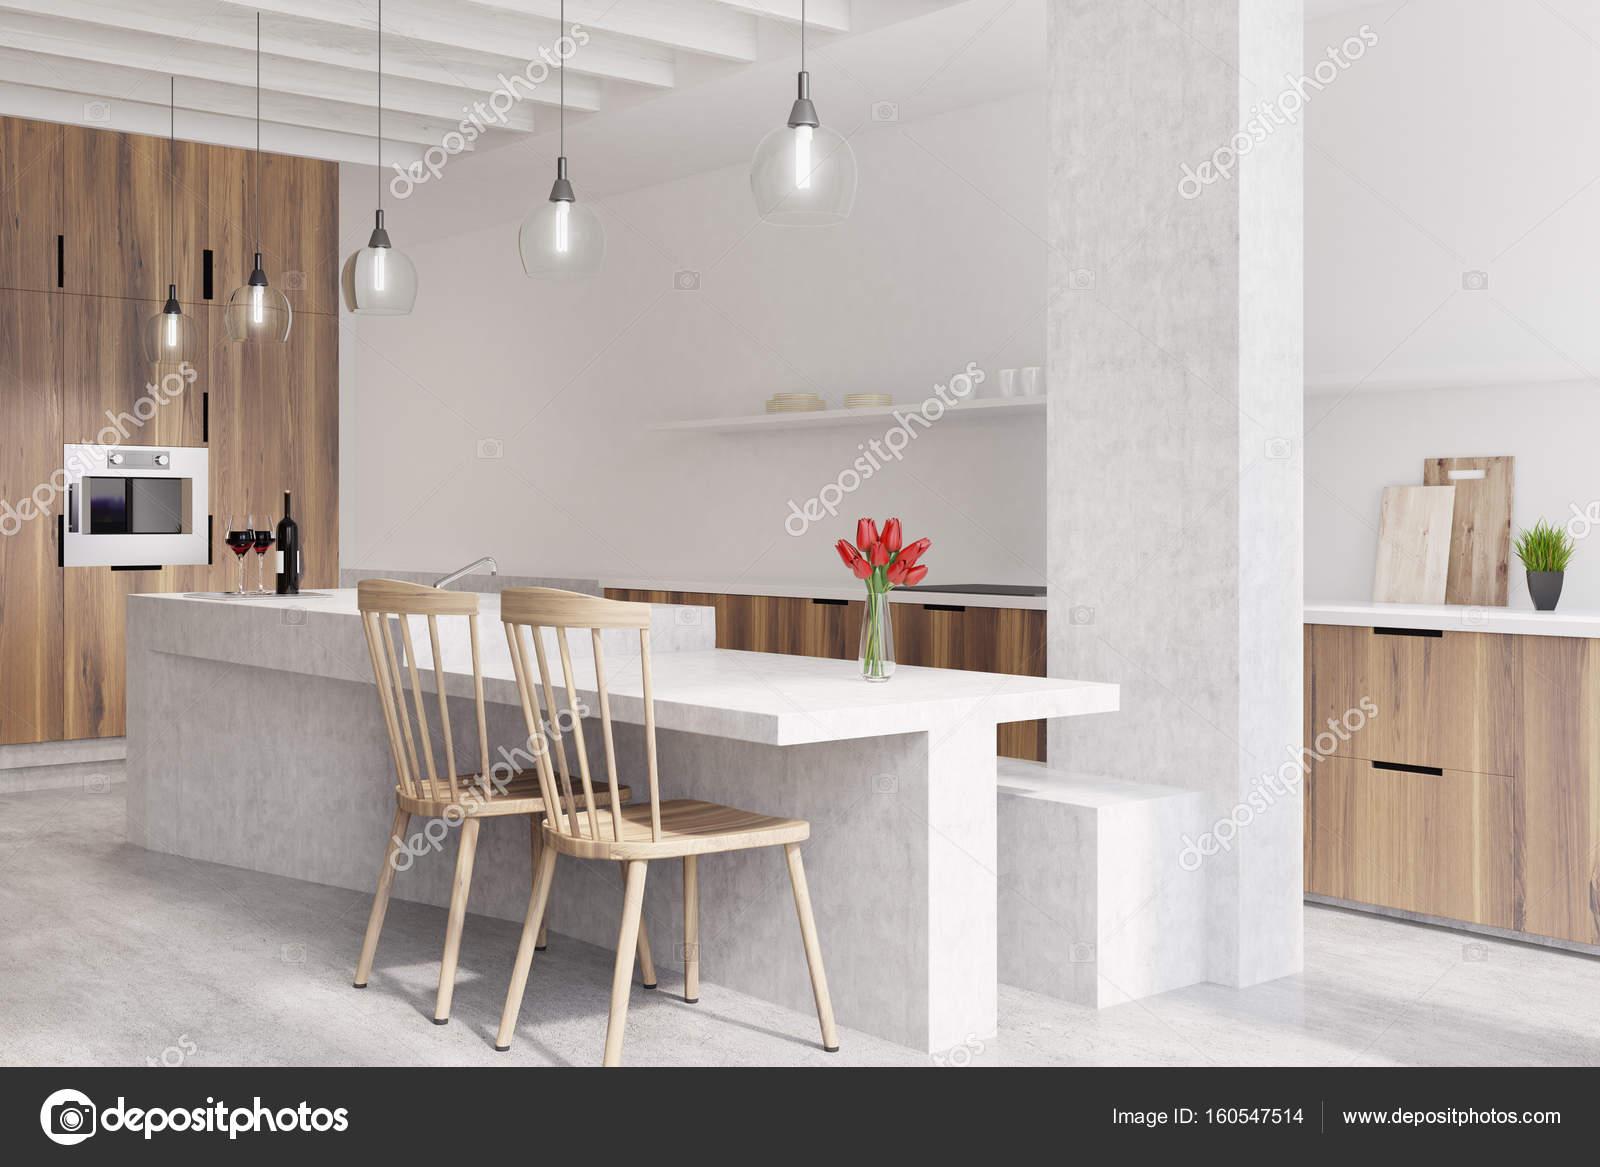 Marmeren bar witte keuken oven u stockfoto denisismagilov